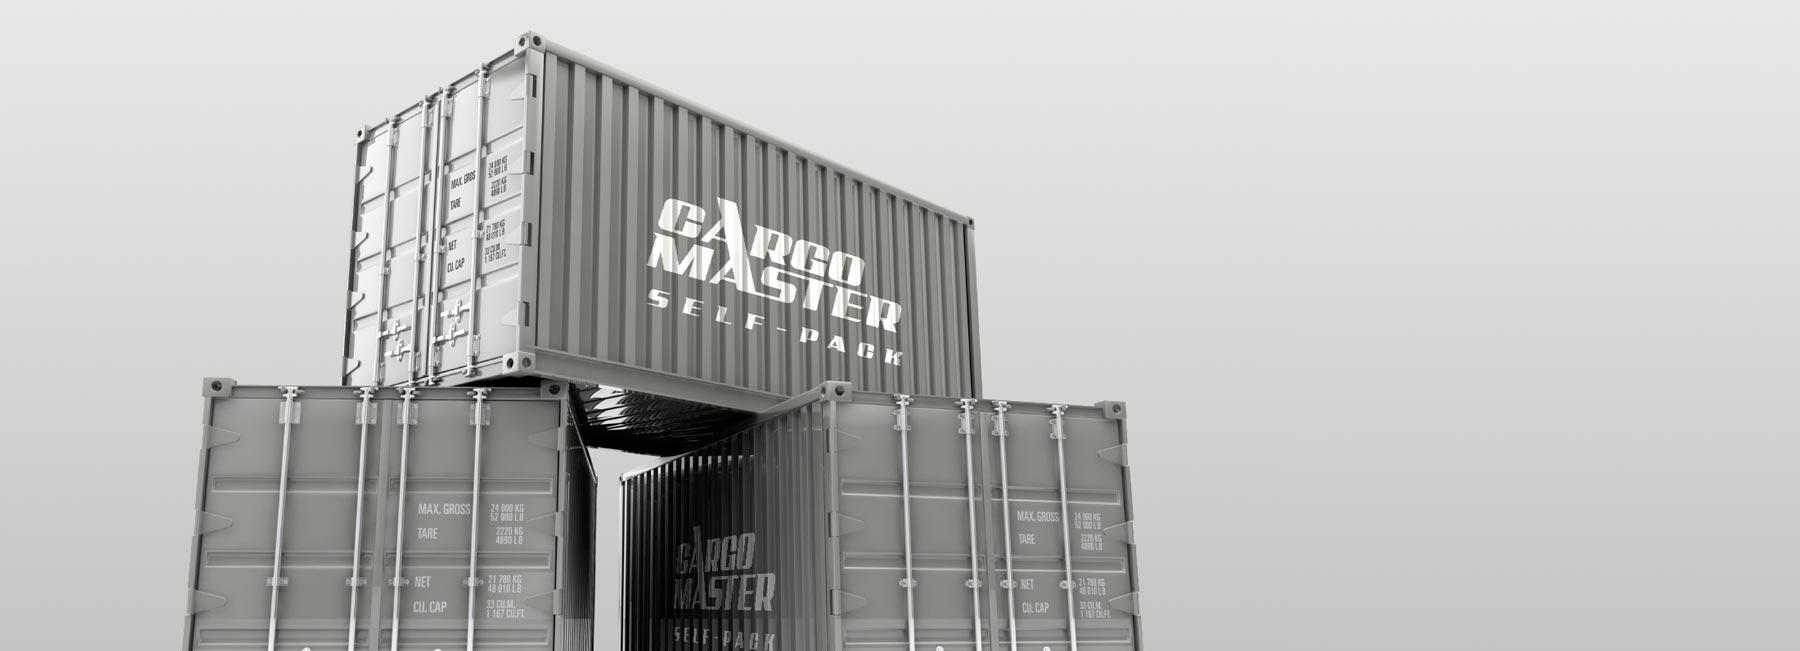 International Freight Forwarders, International Freight Forwarding, International Freight Forwarding Companies